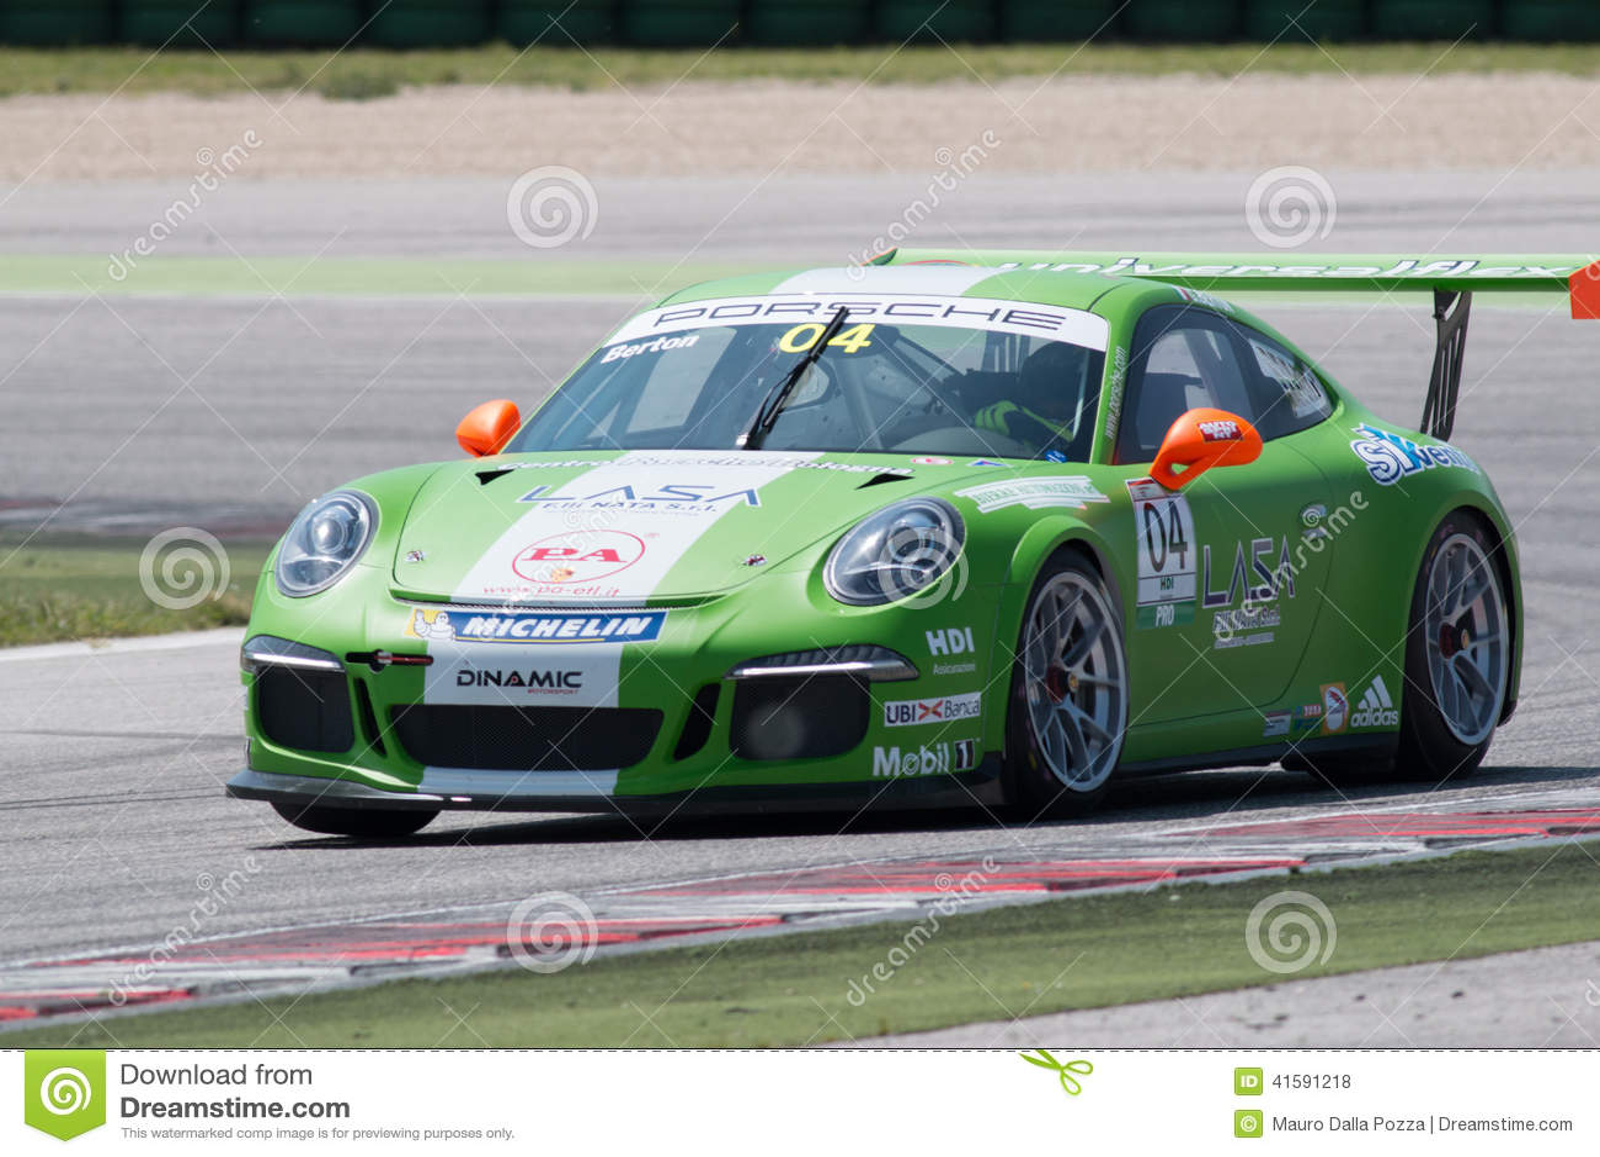 Porsche 911 Gt3 Cup Race Car Editorial Stock Photo Image Of